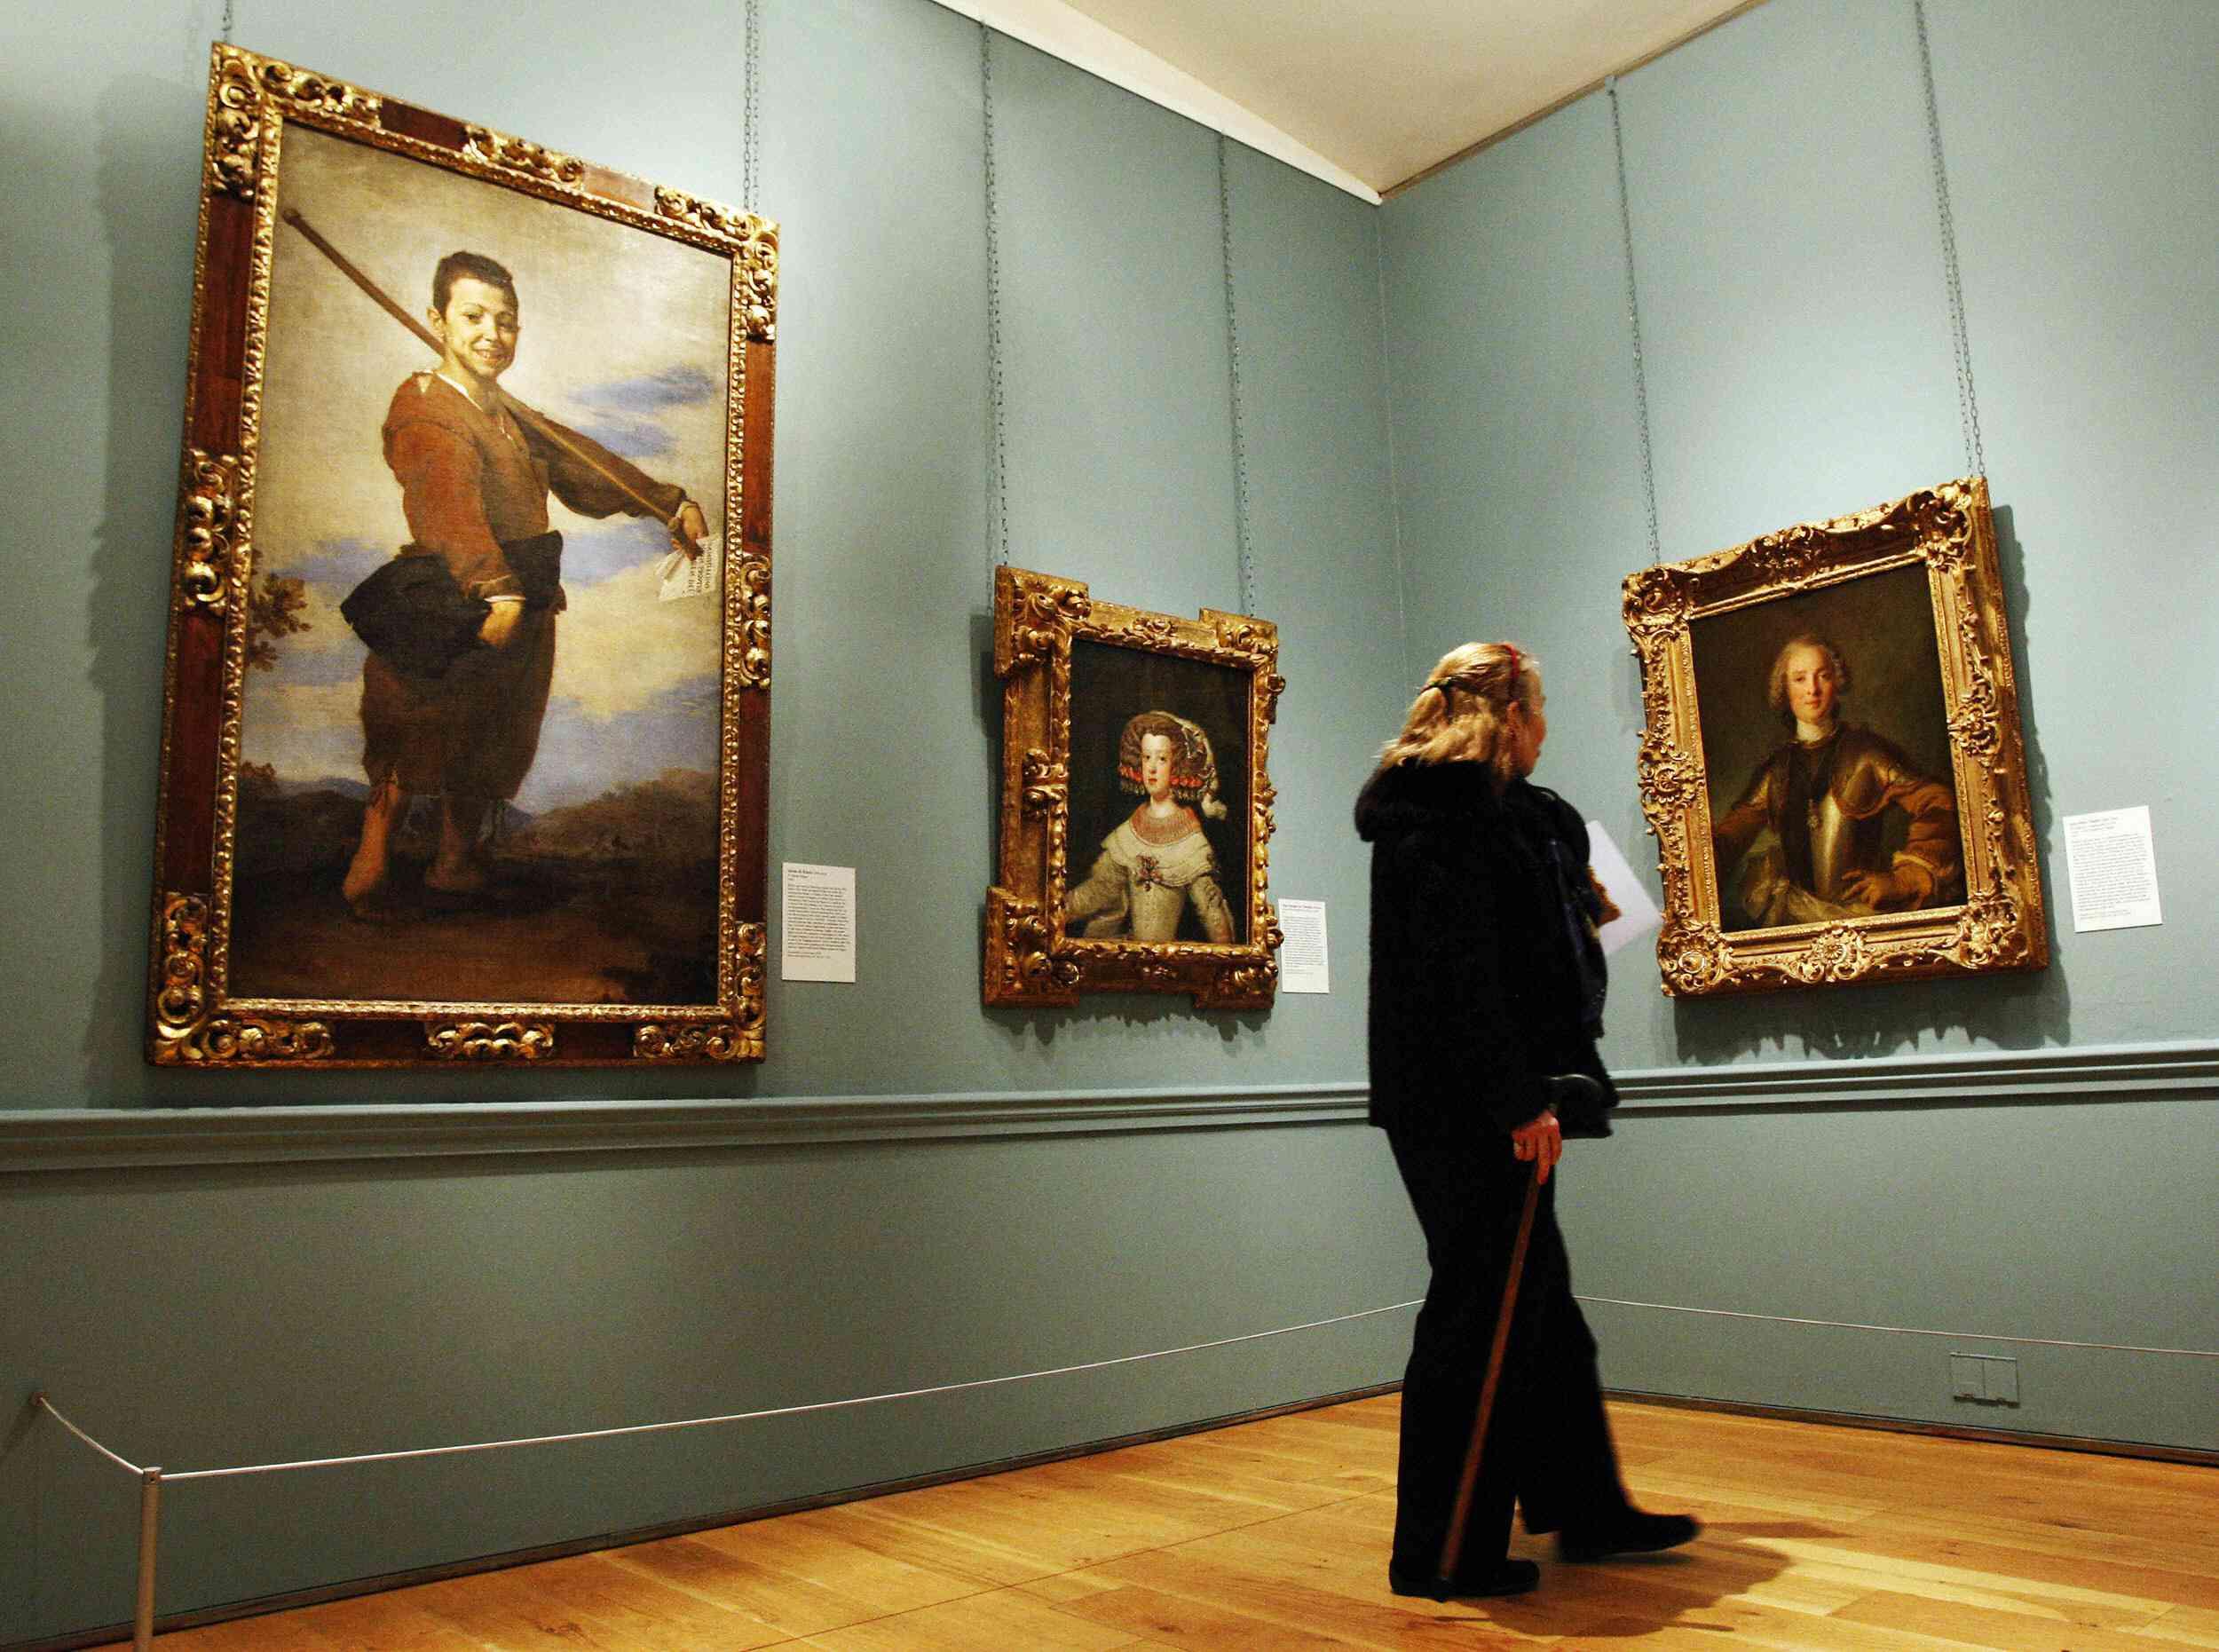 A visitor admires paintings, Jose de Rib